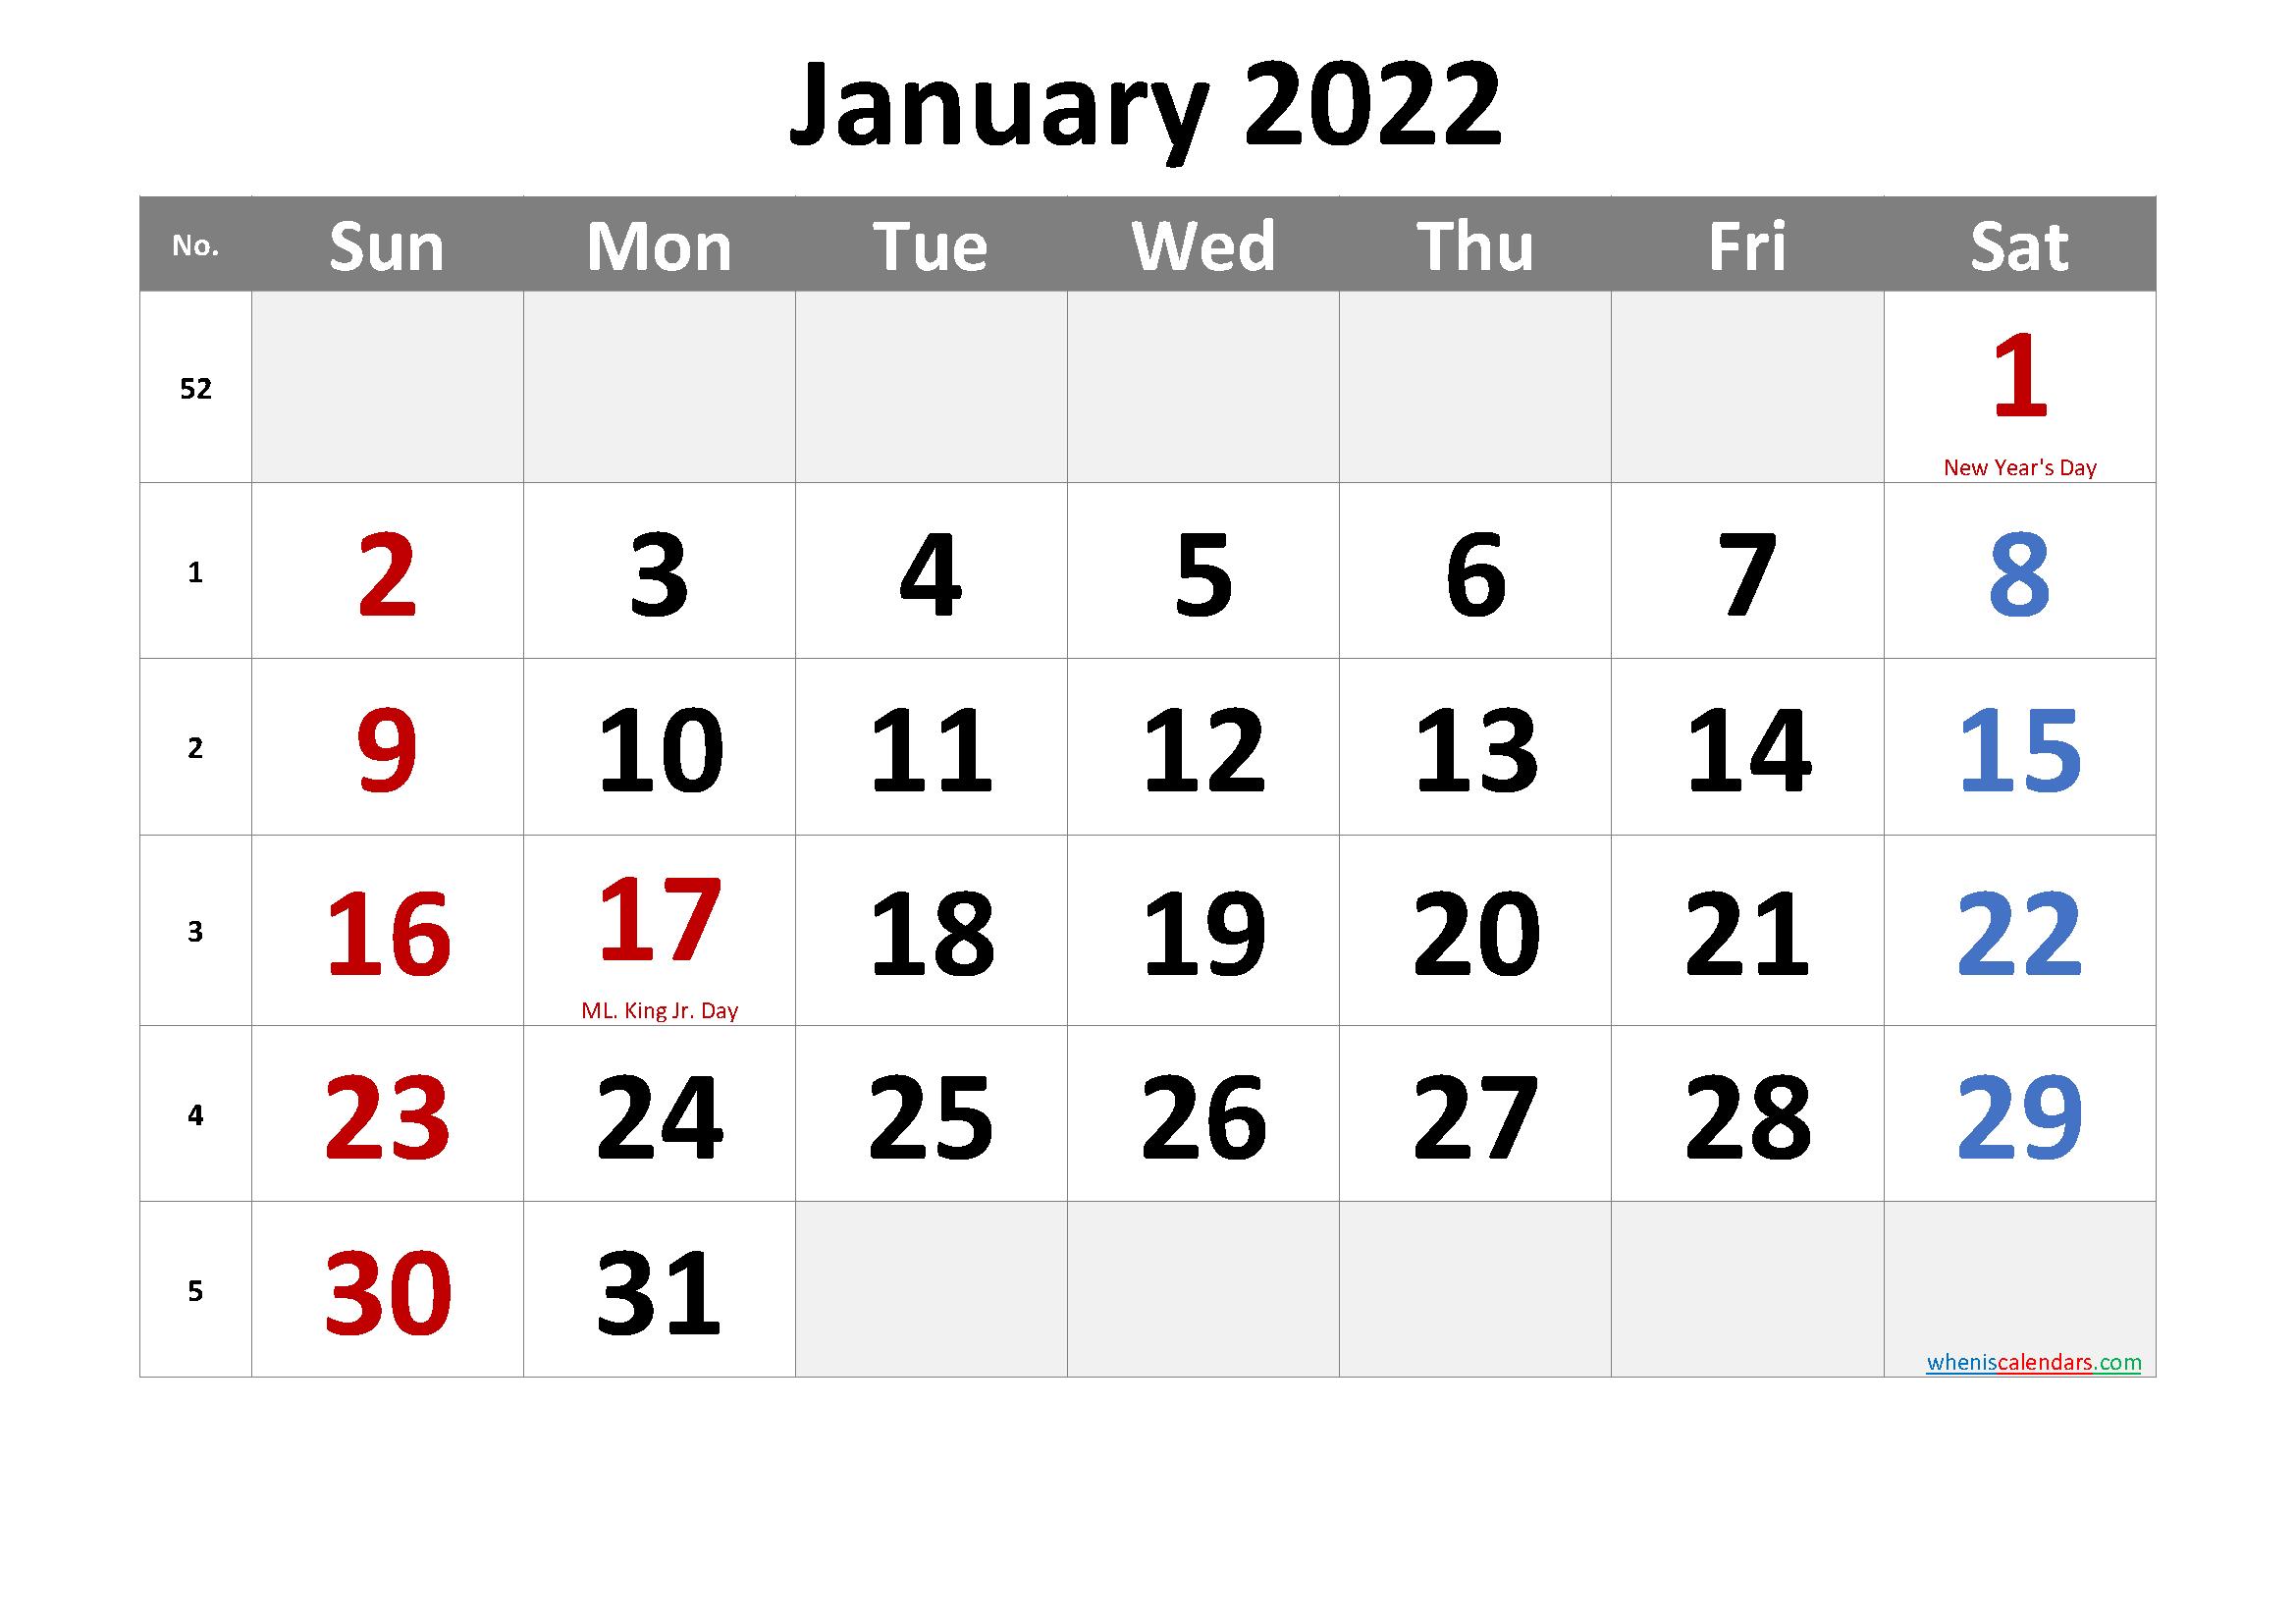 Free Printable JANUARY 2022 Calendar with Holidays